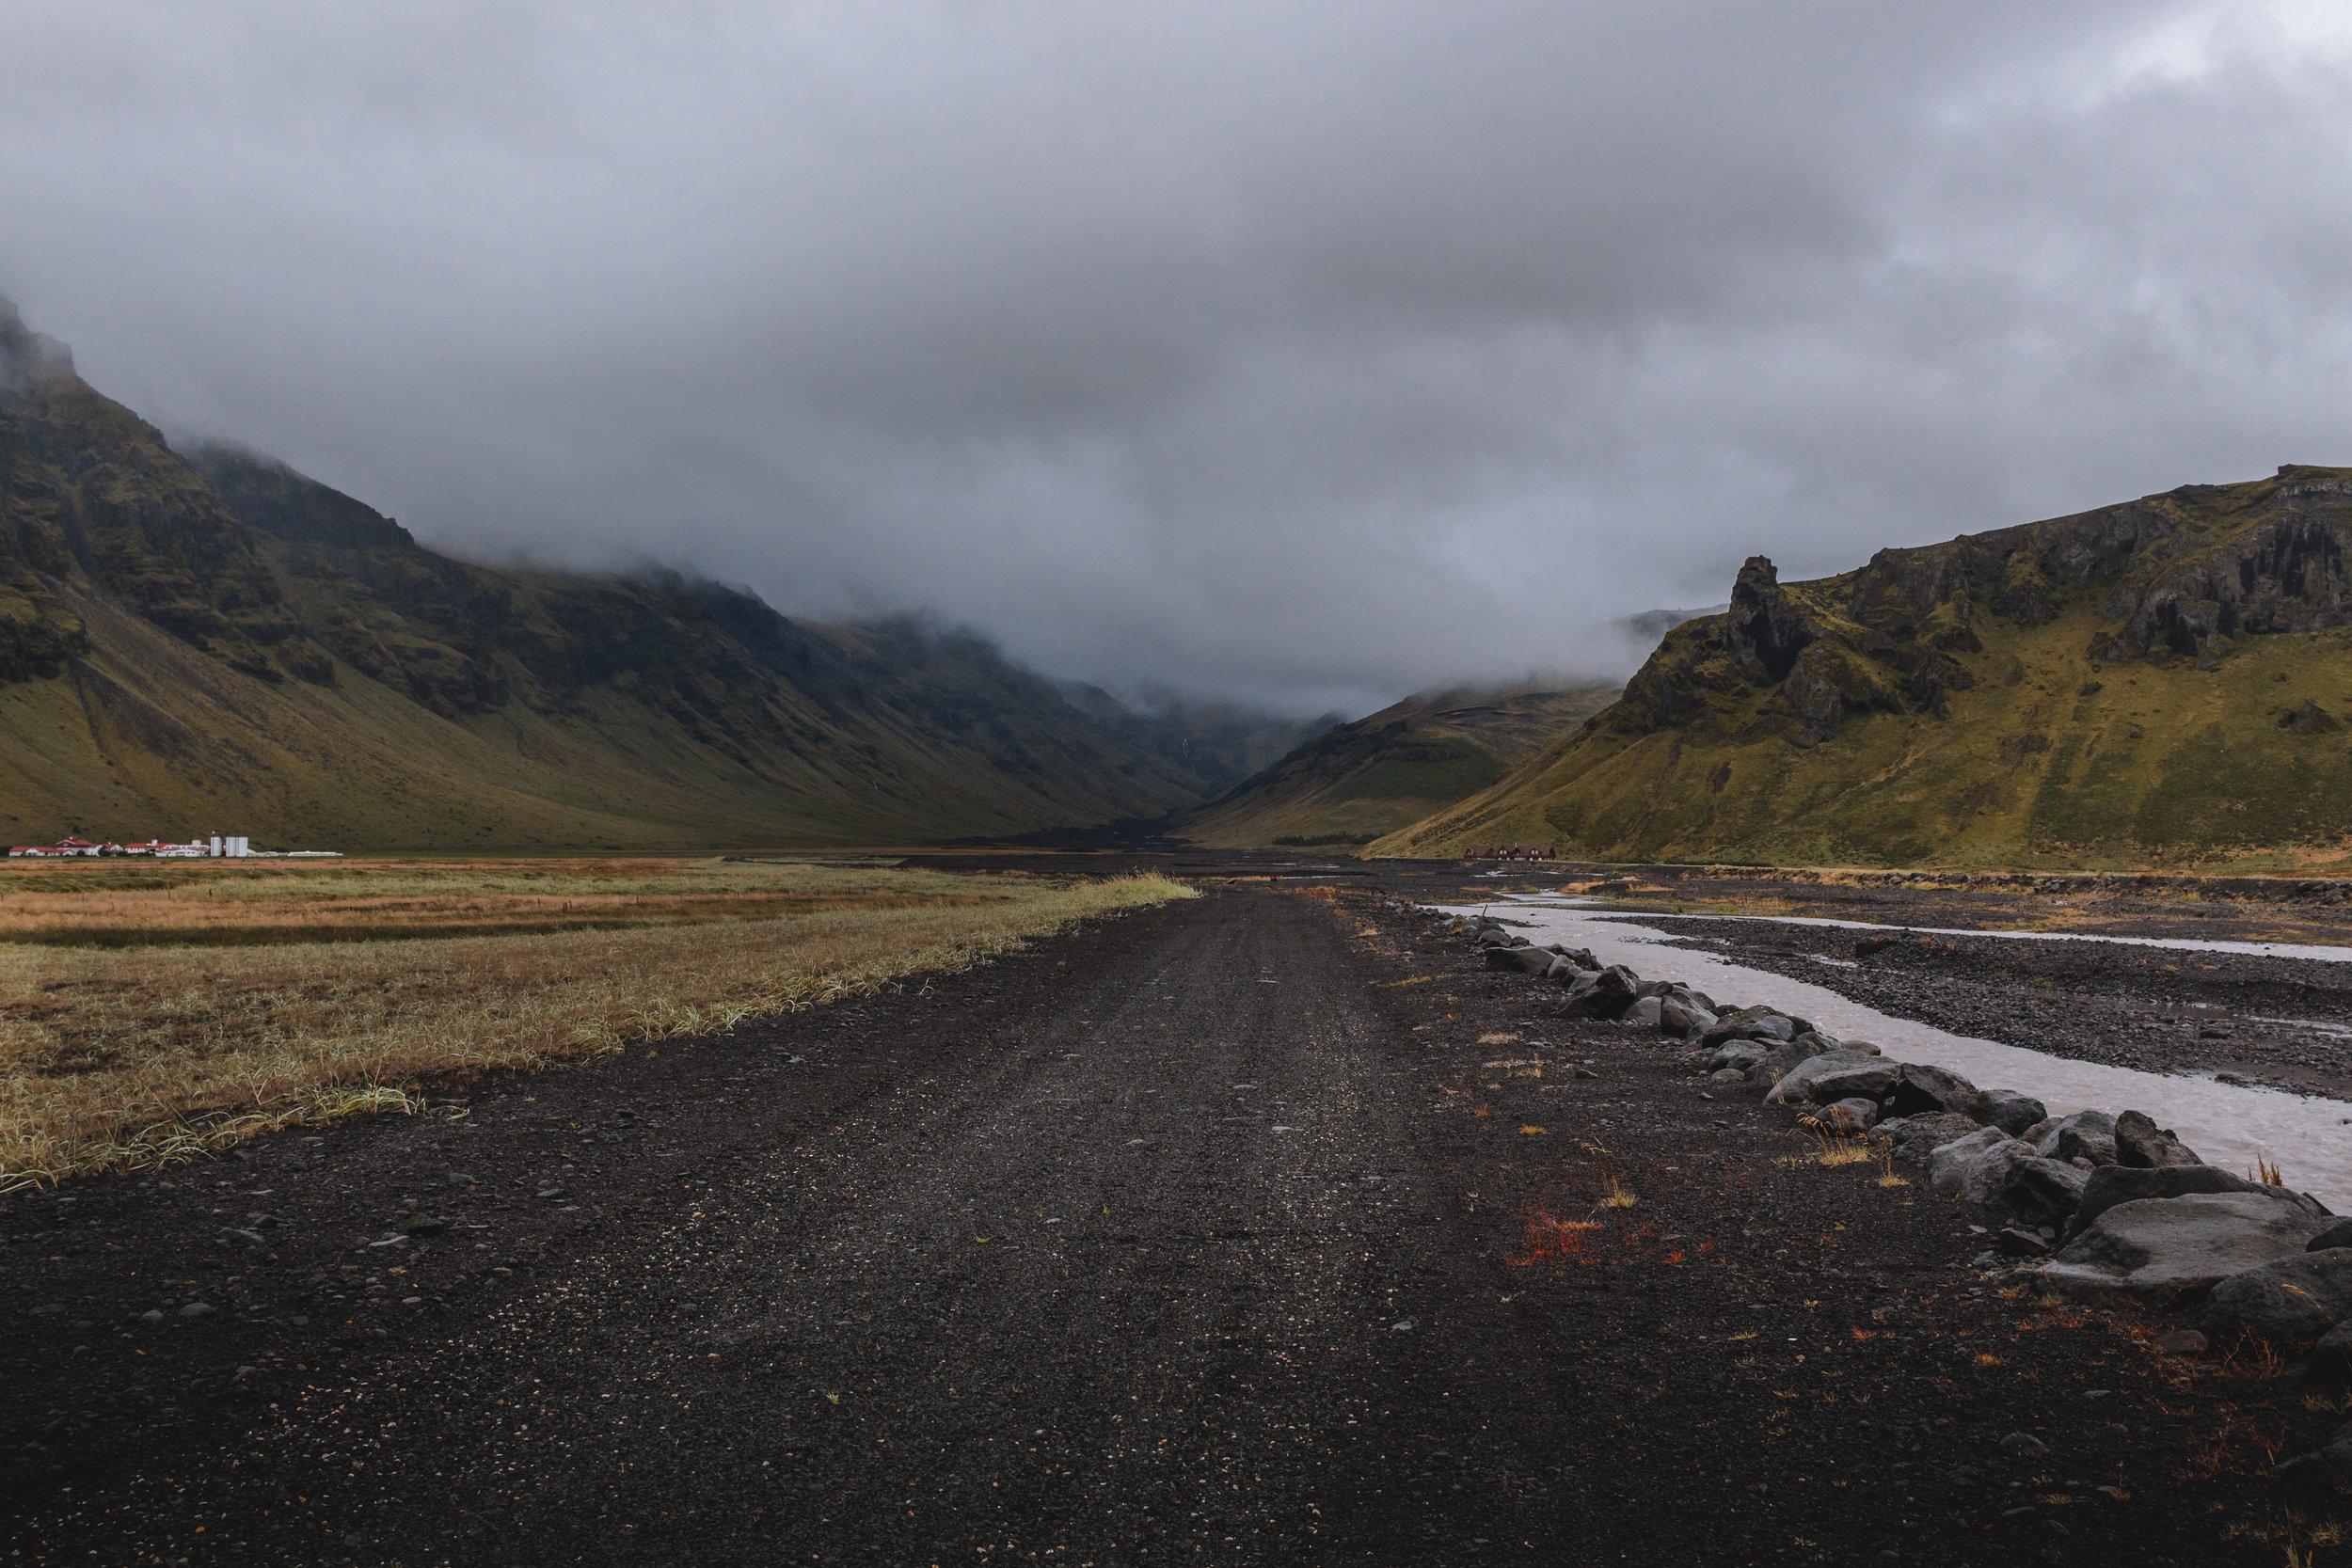 Road leading into Landmannalaugar